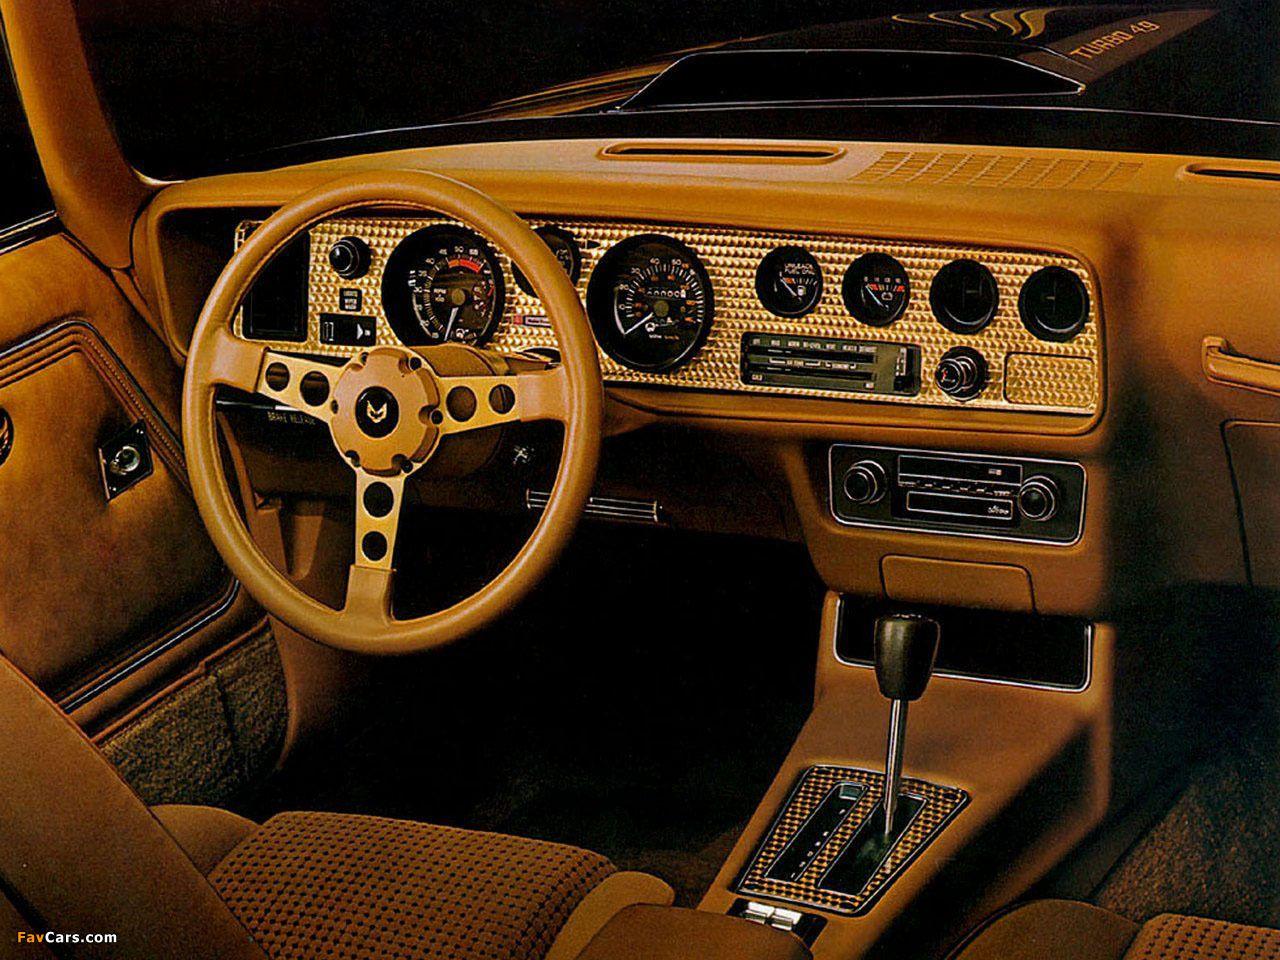 1980 pontiac firebird trans am 4 9l turbo v8 interior garage rh pinterest com Pontiac Fiero Advertisement 2017 Pontiac Fiero